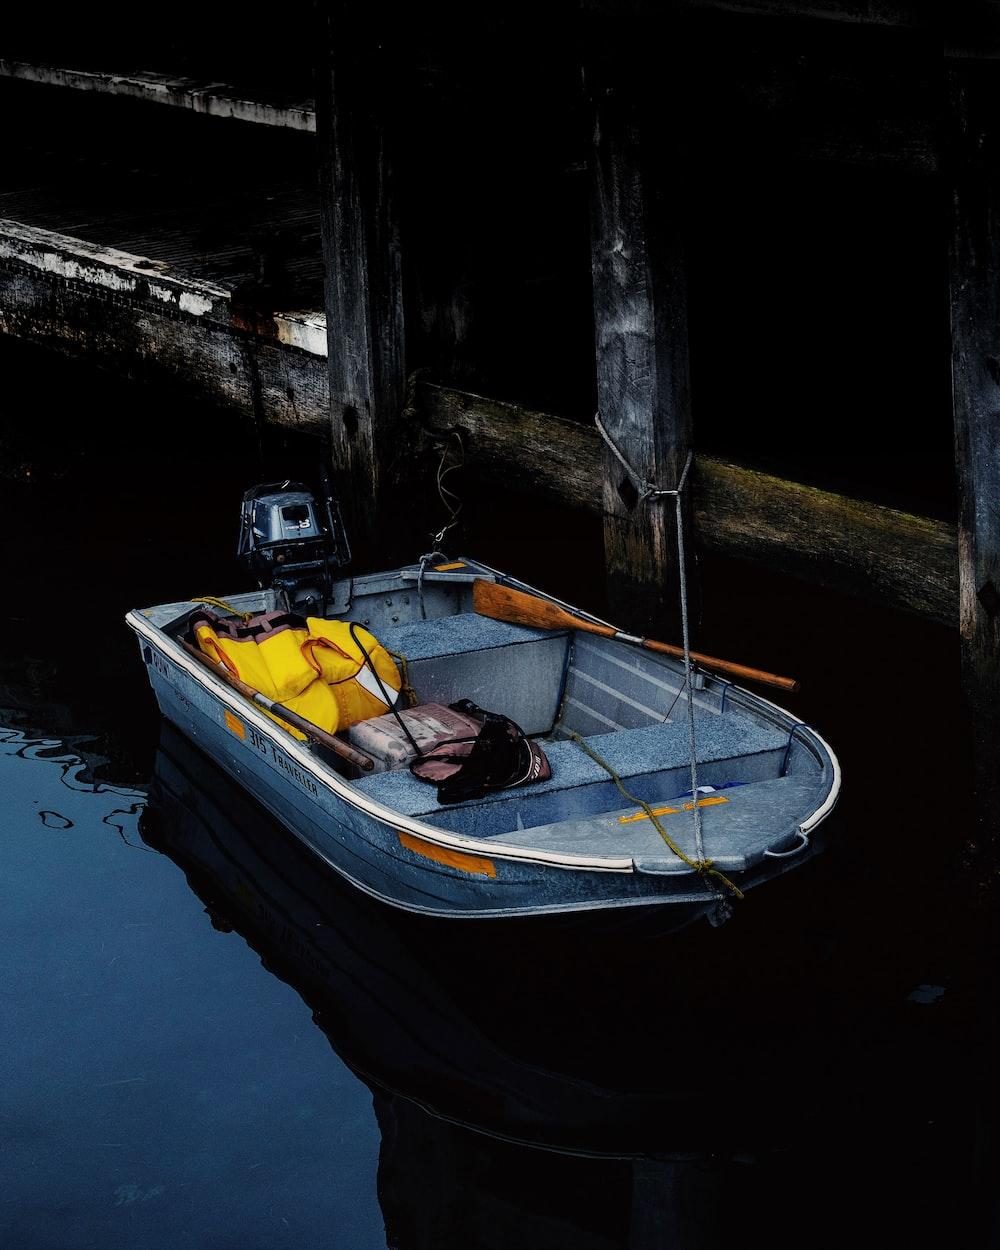 grey jon boat on water